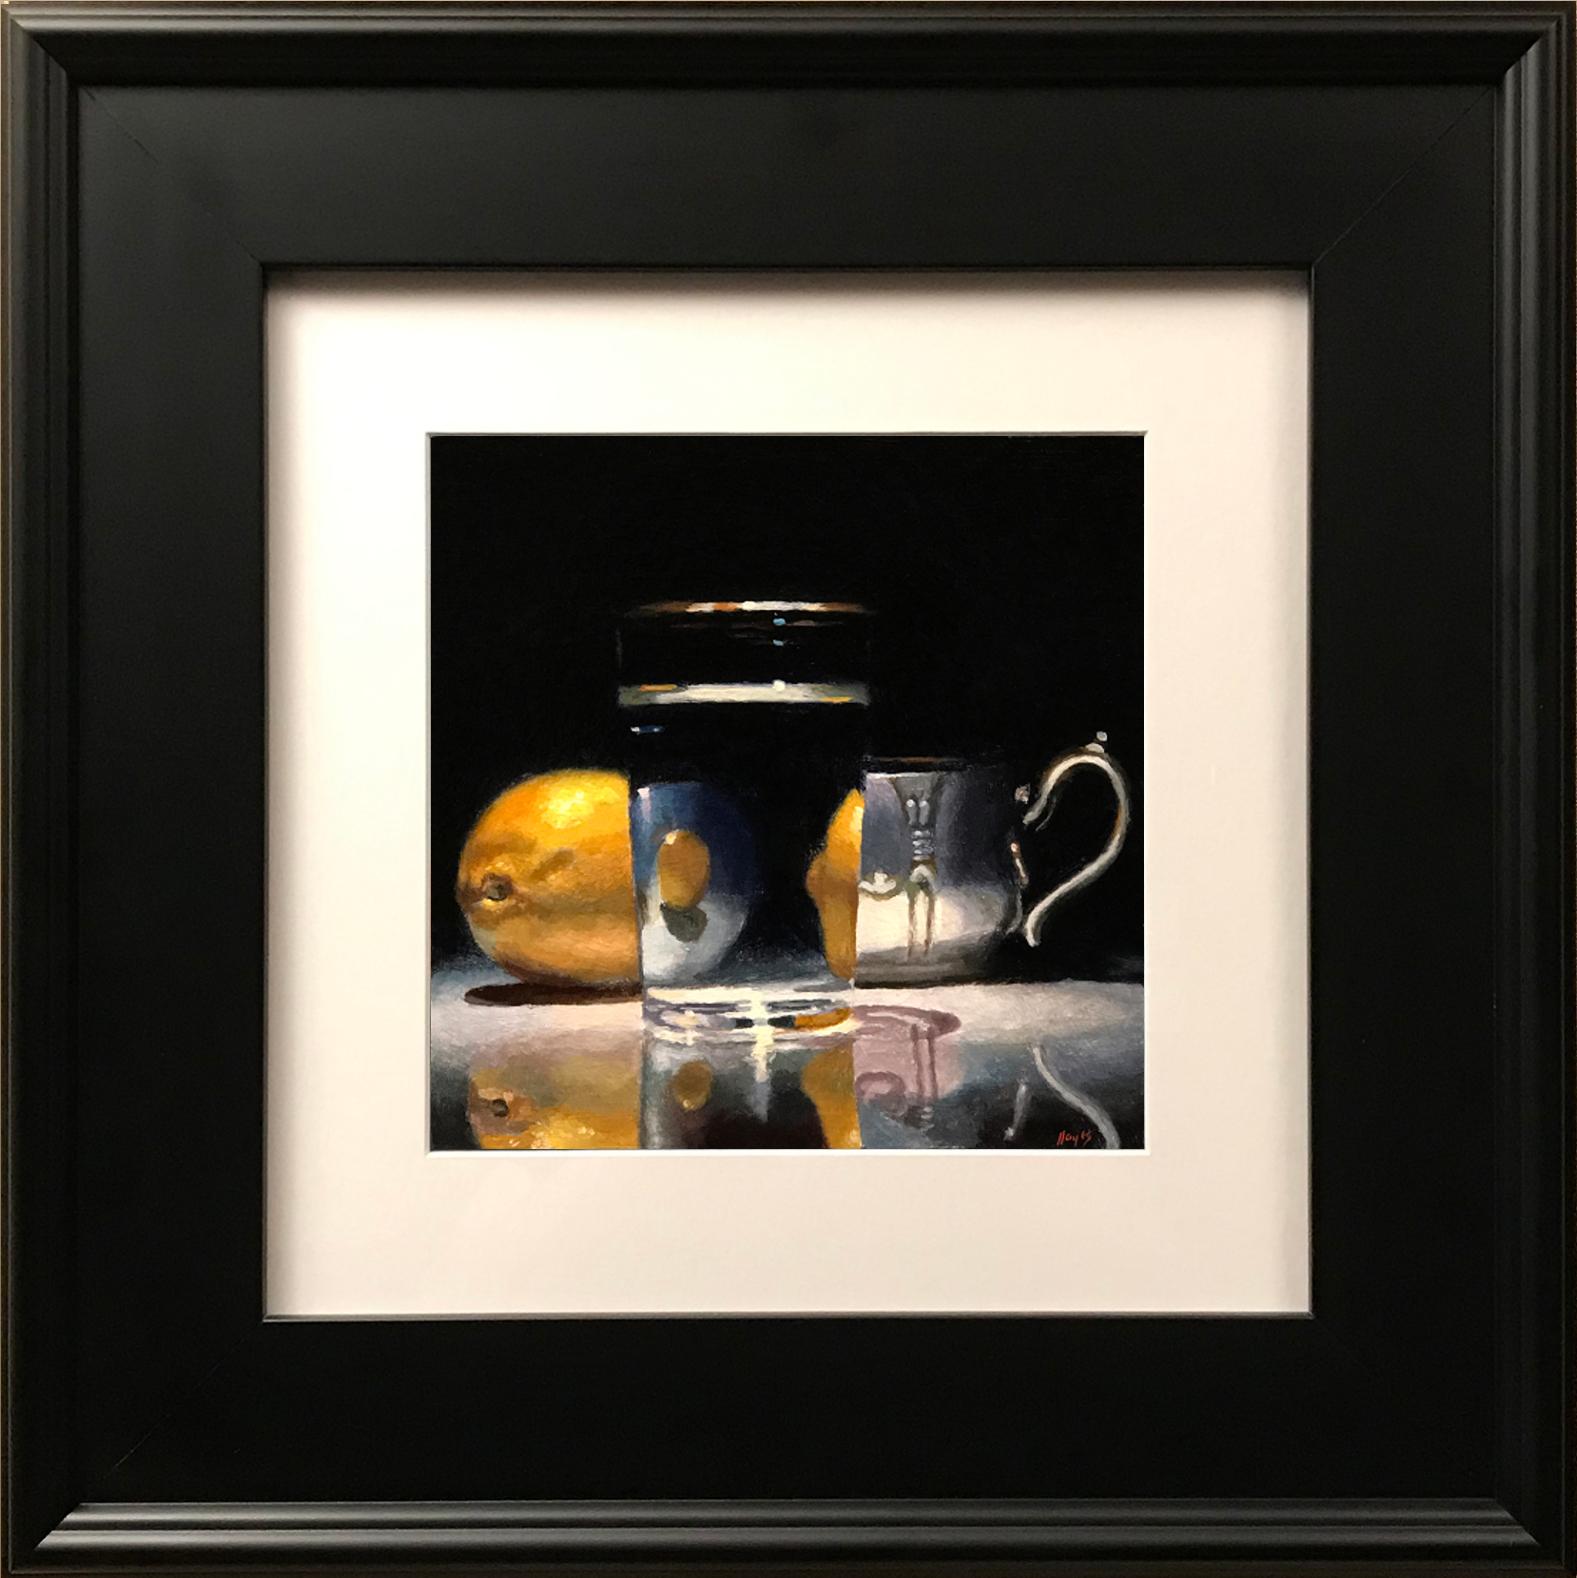 101490-square-print-plein-air-framed-black-cropped